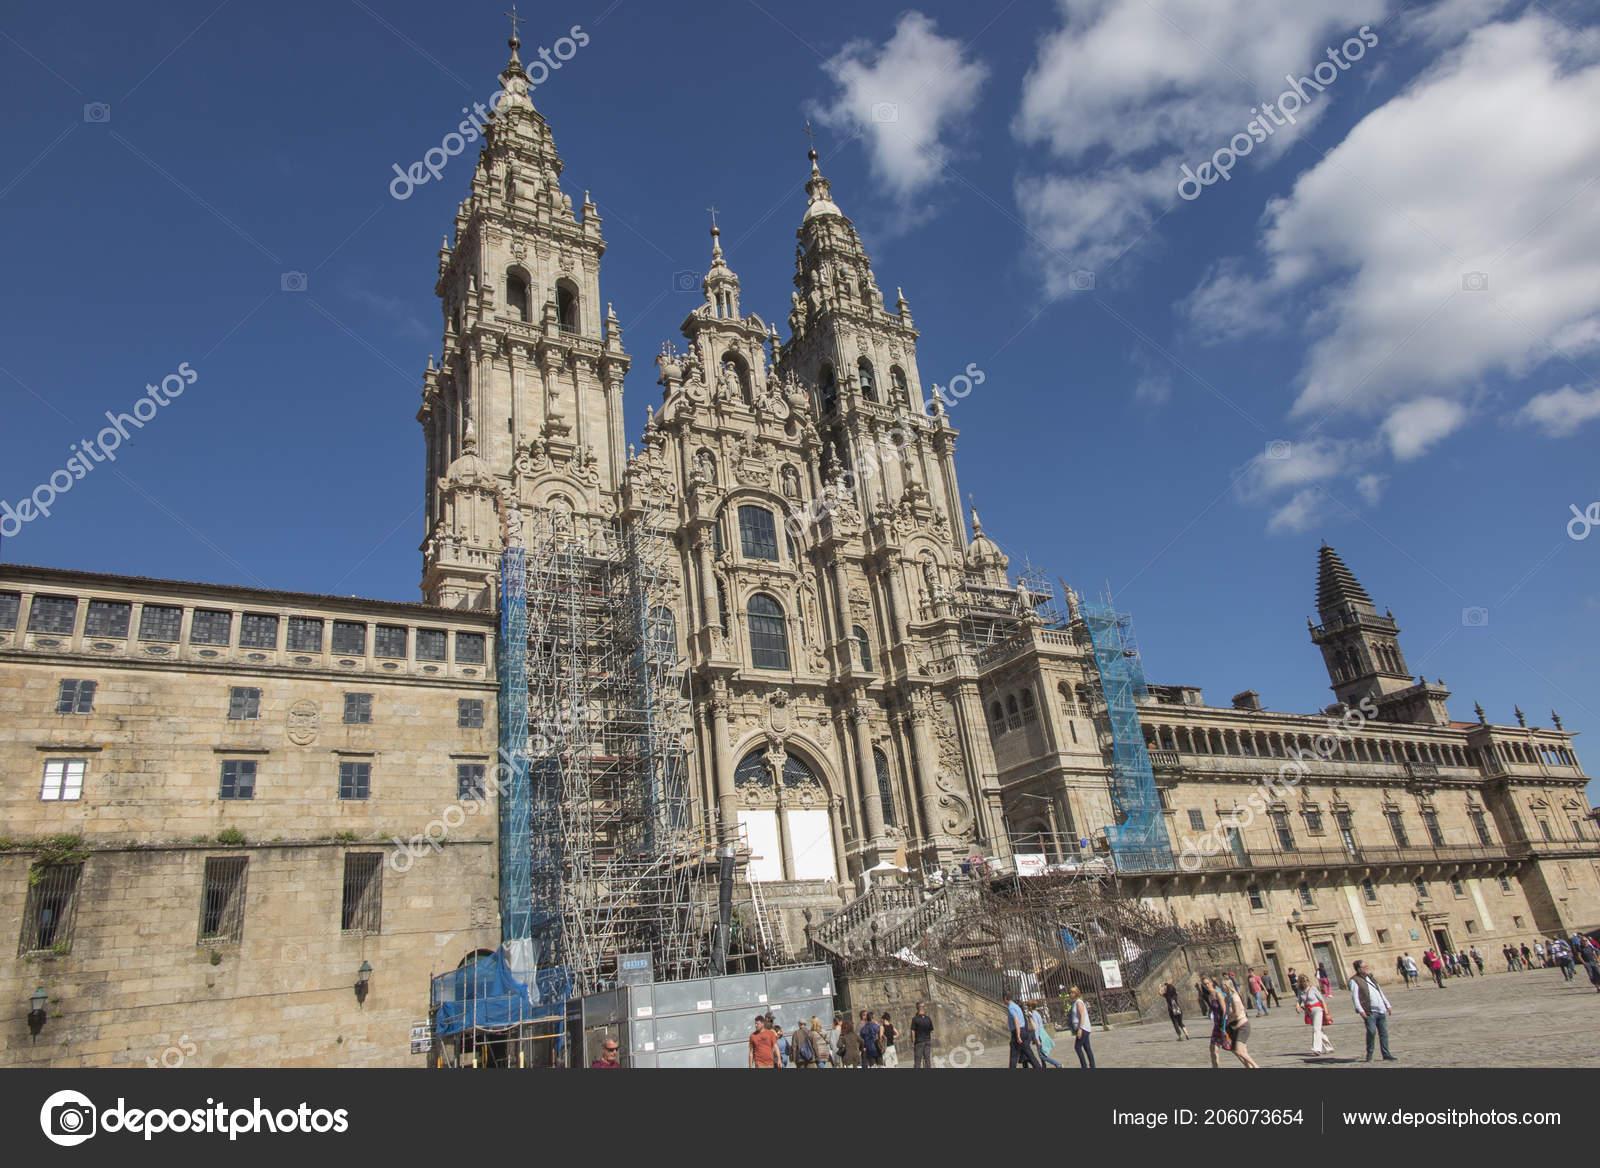 Terra Chat Santiago de Compostela